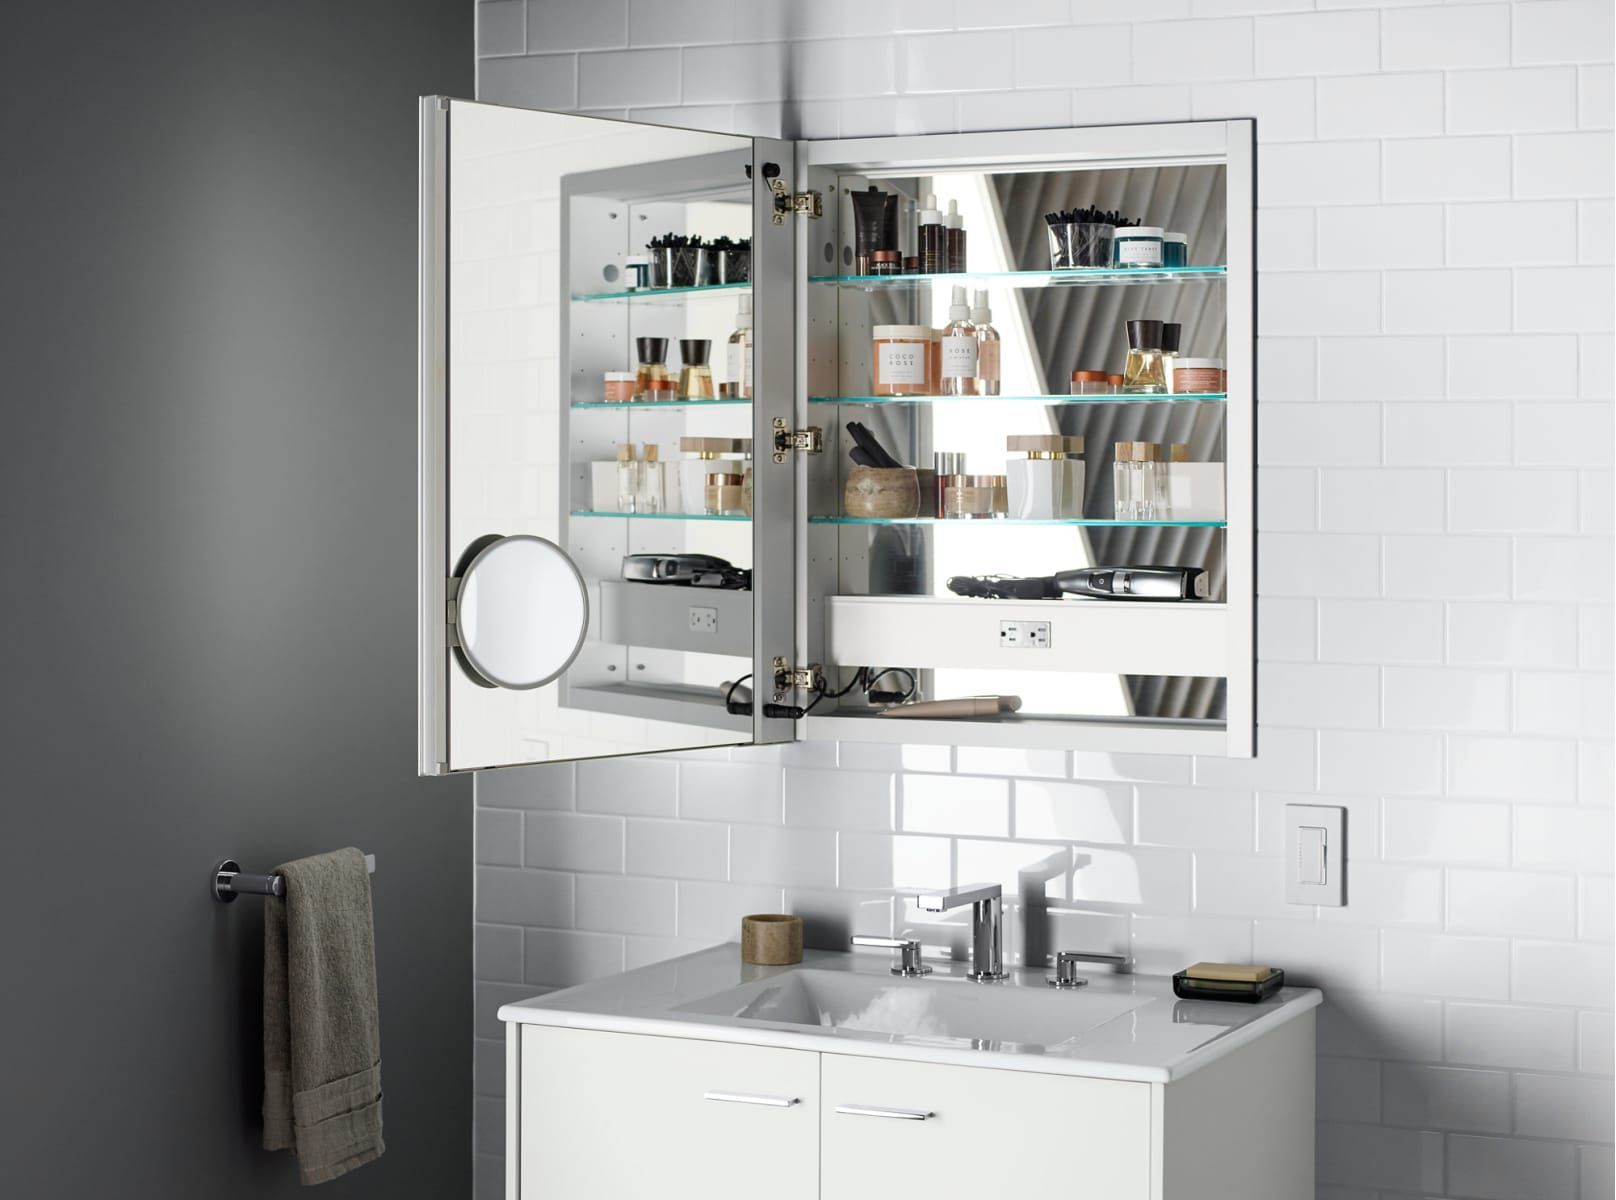 Kohler K 99007 Tl Na Mirrored Verdera 24 W X 30 H Single Door